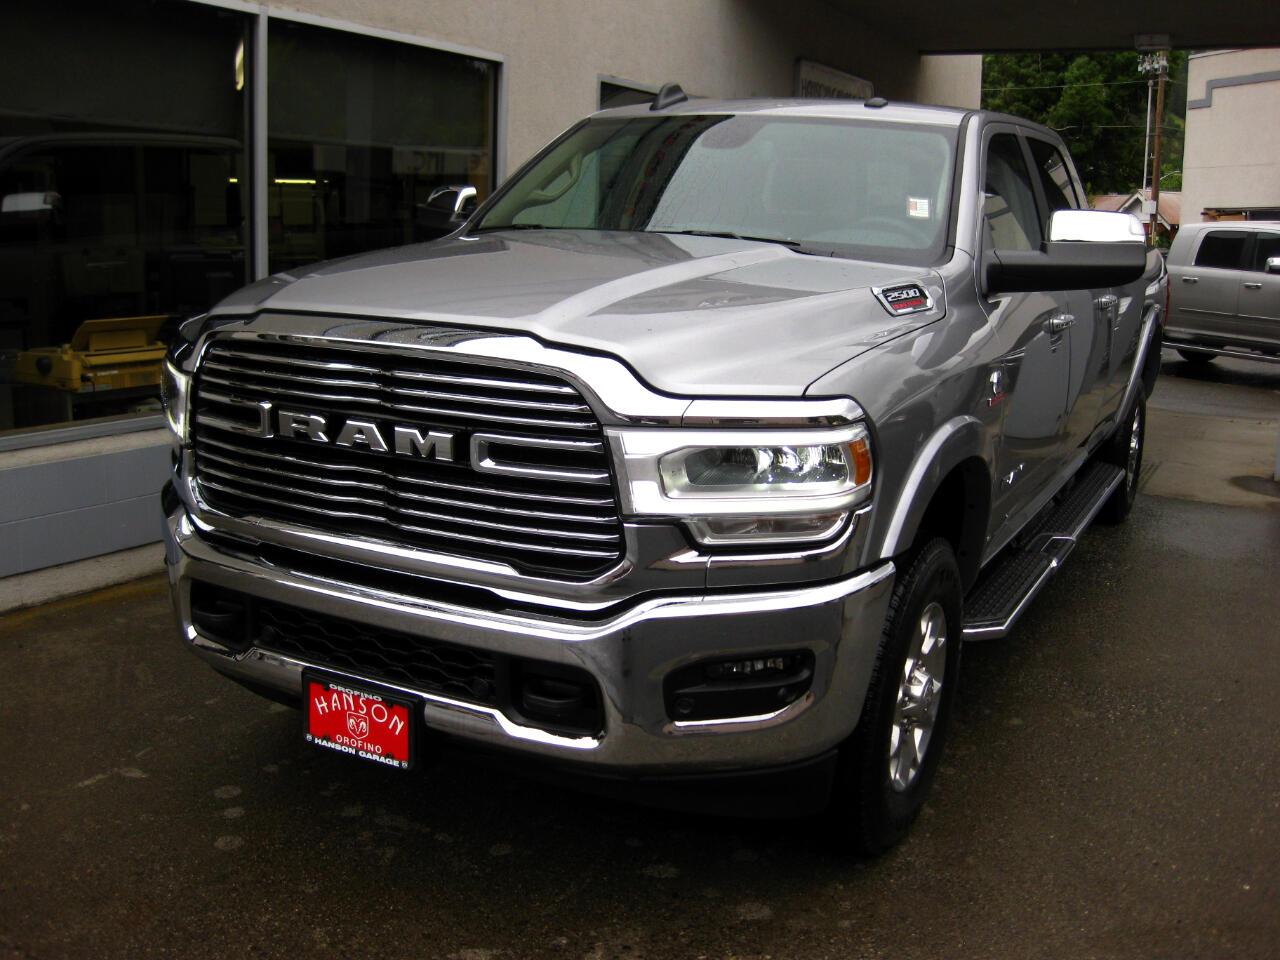 2019 RAM 2500 Laramie 4x4 Crew Cab 8' Box